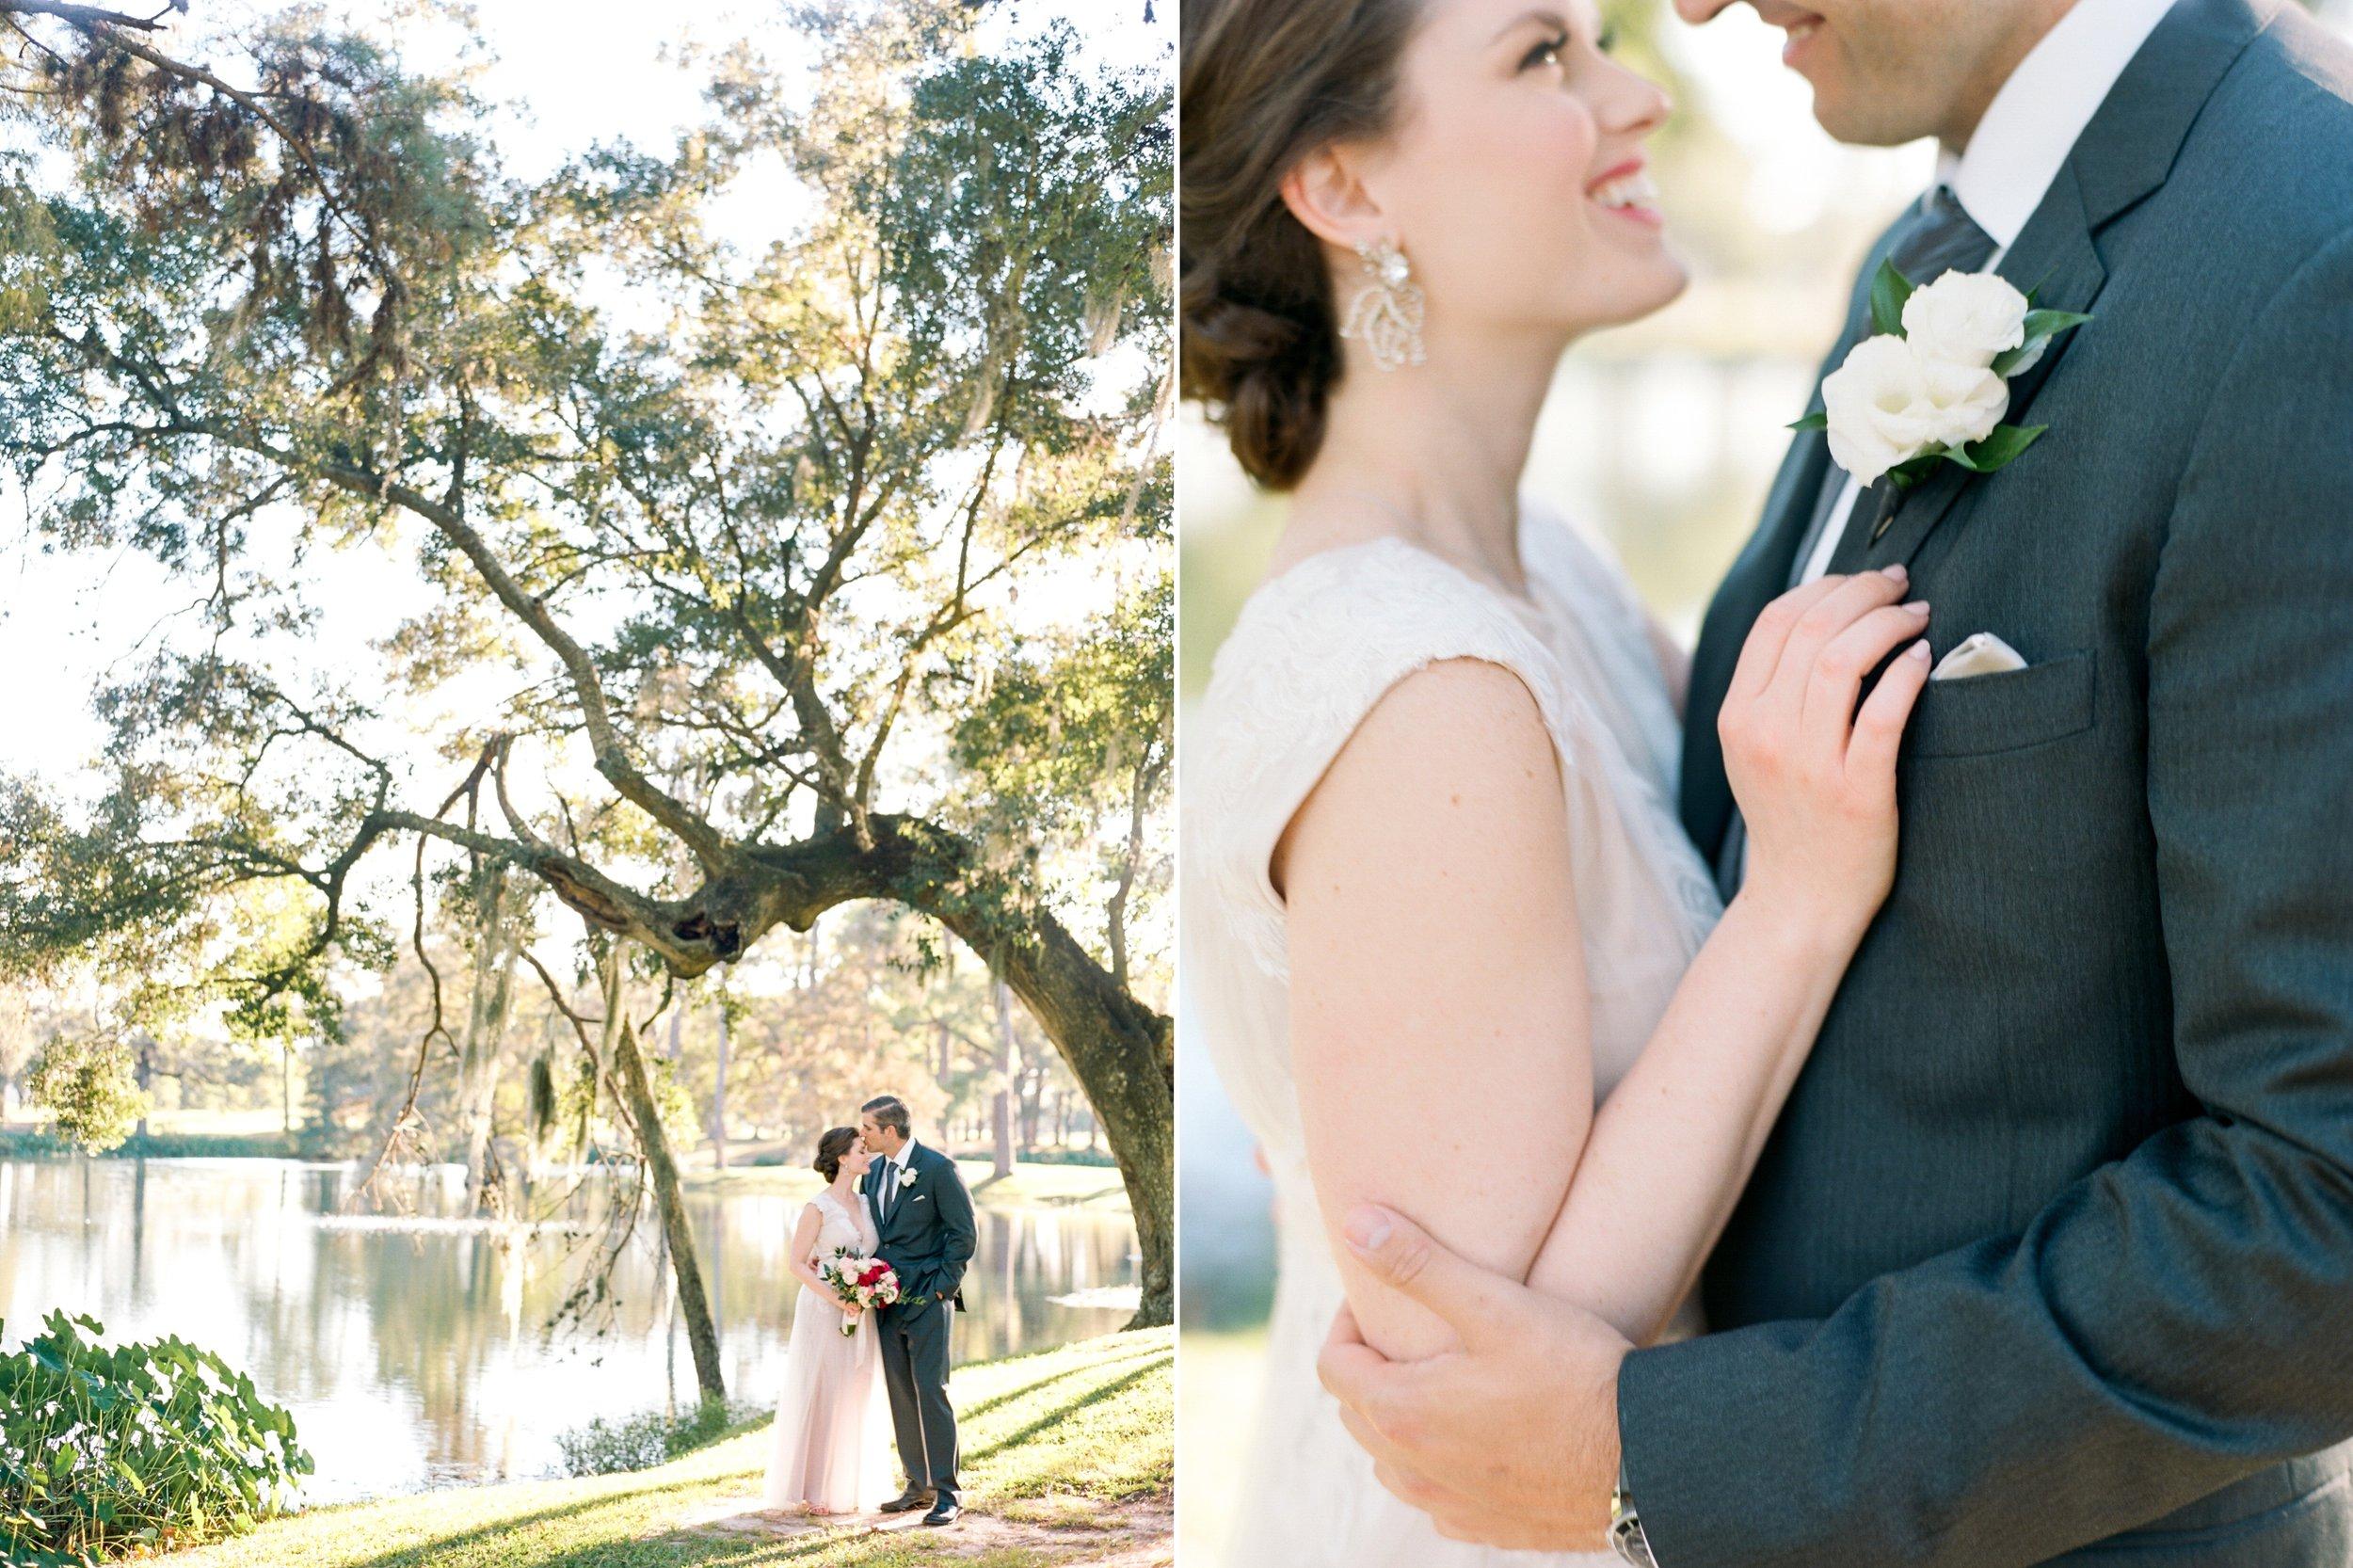 Houston-Wedding-Photographer-Lakeside-Country-Club-First-Look-Bride-Groom-Formals-Film-Fine-Art-Photography-494.jpg